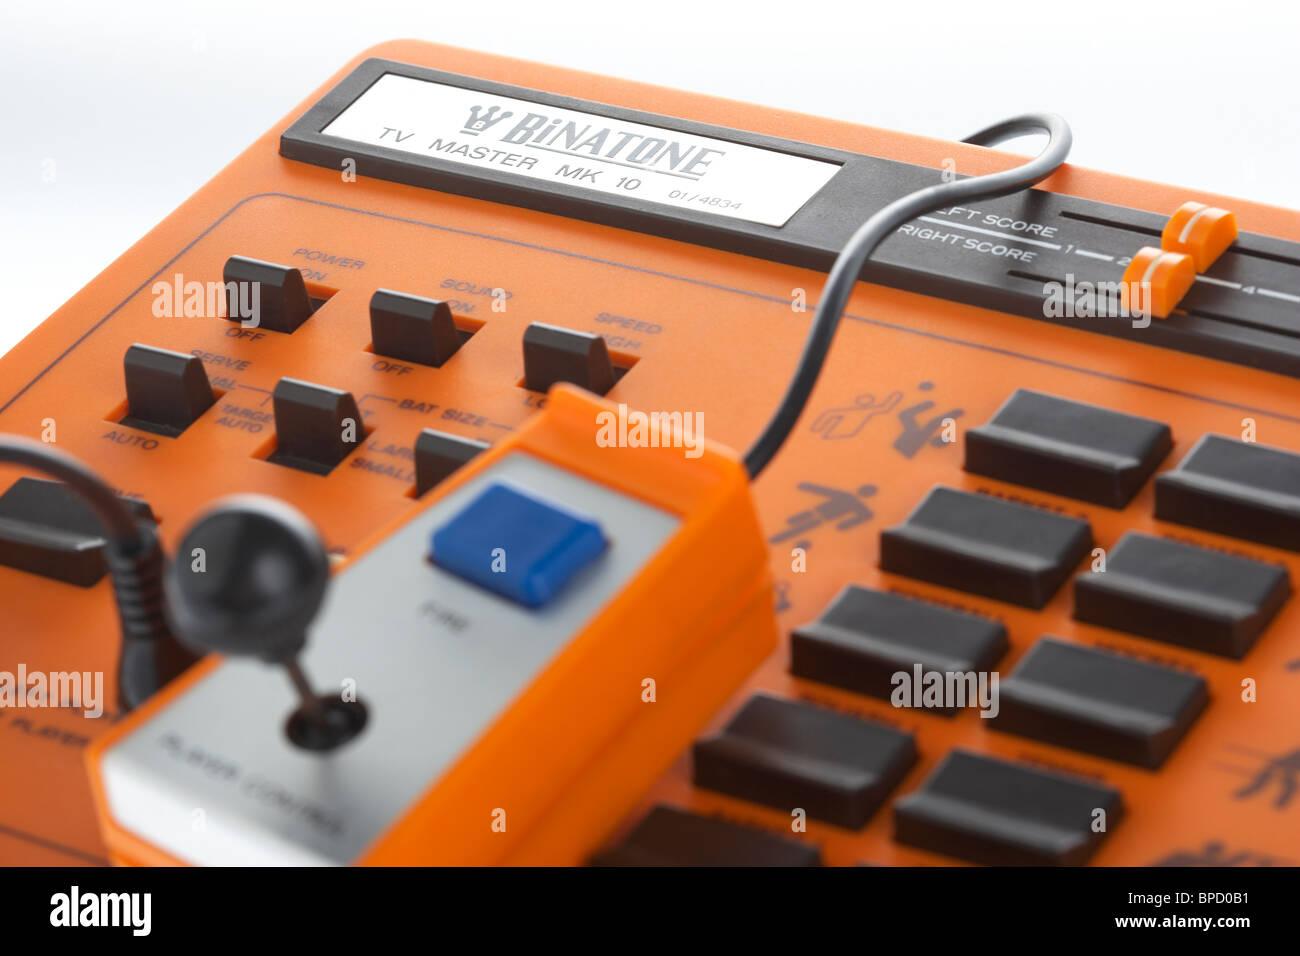 retro electronic video game binatone tv master mk 10 pong clone variant - Stock Image